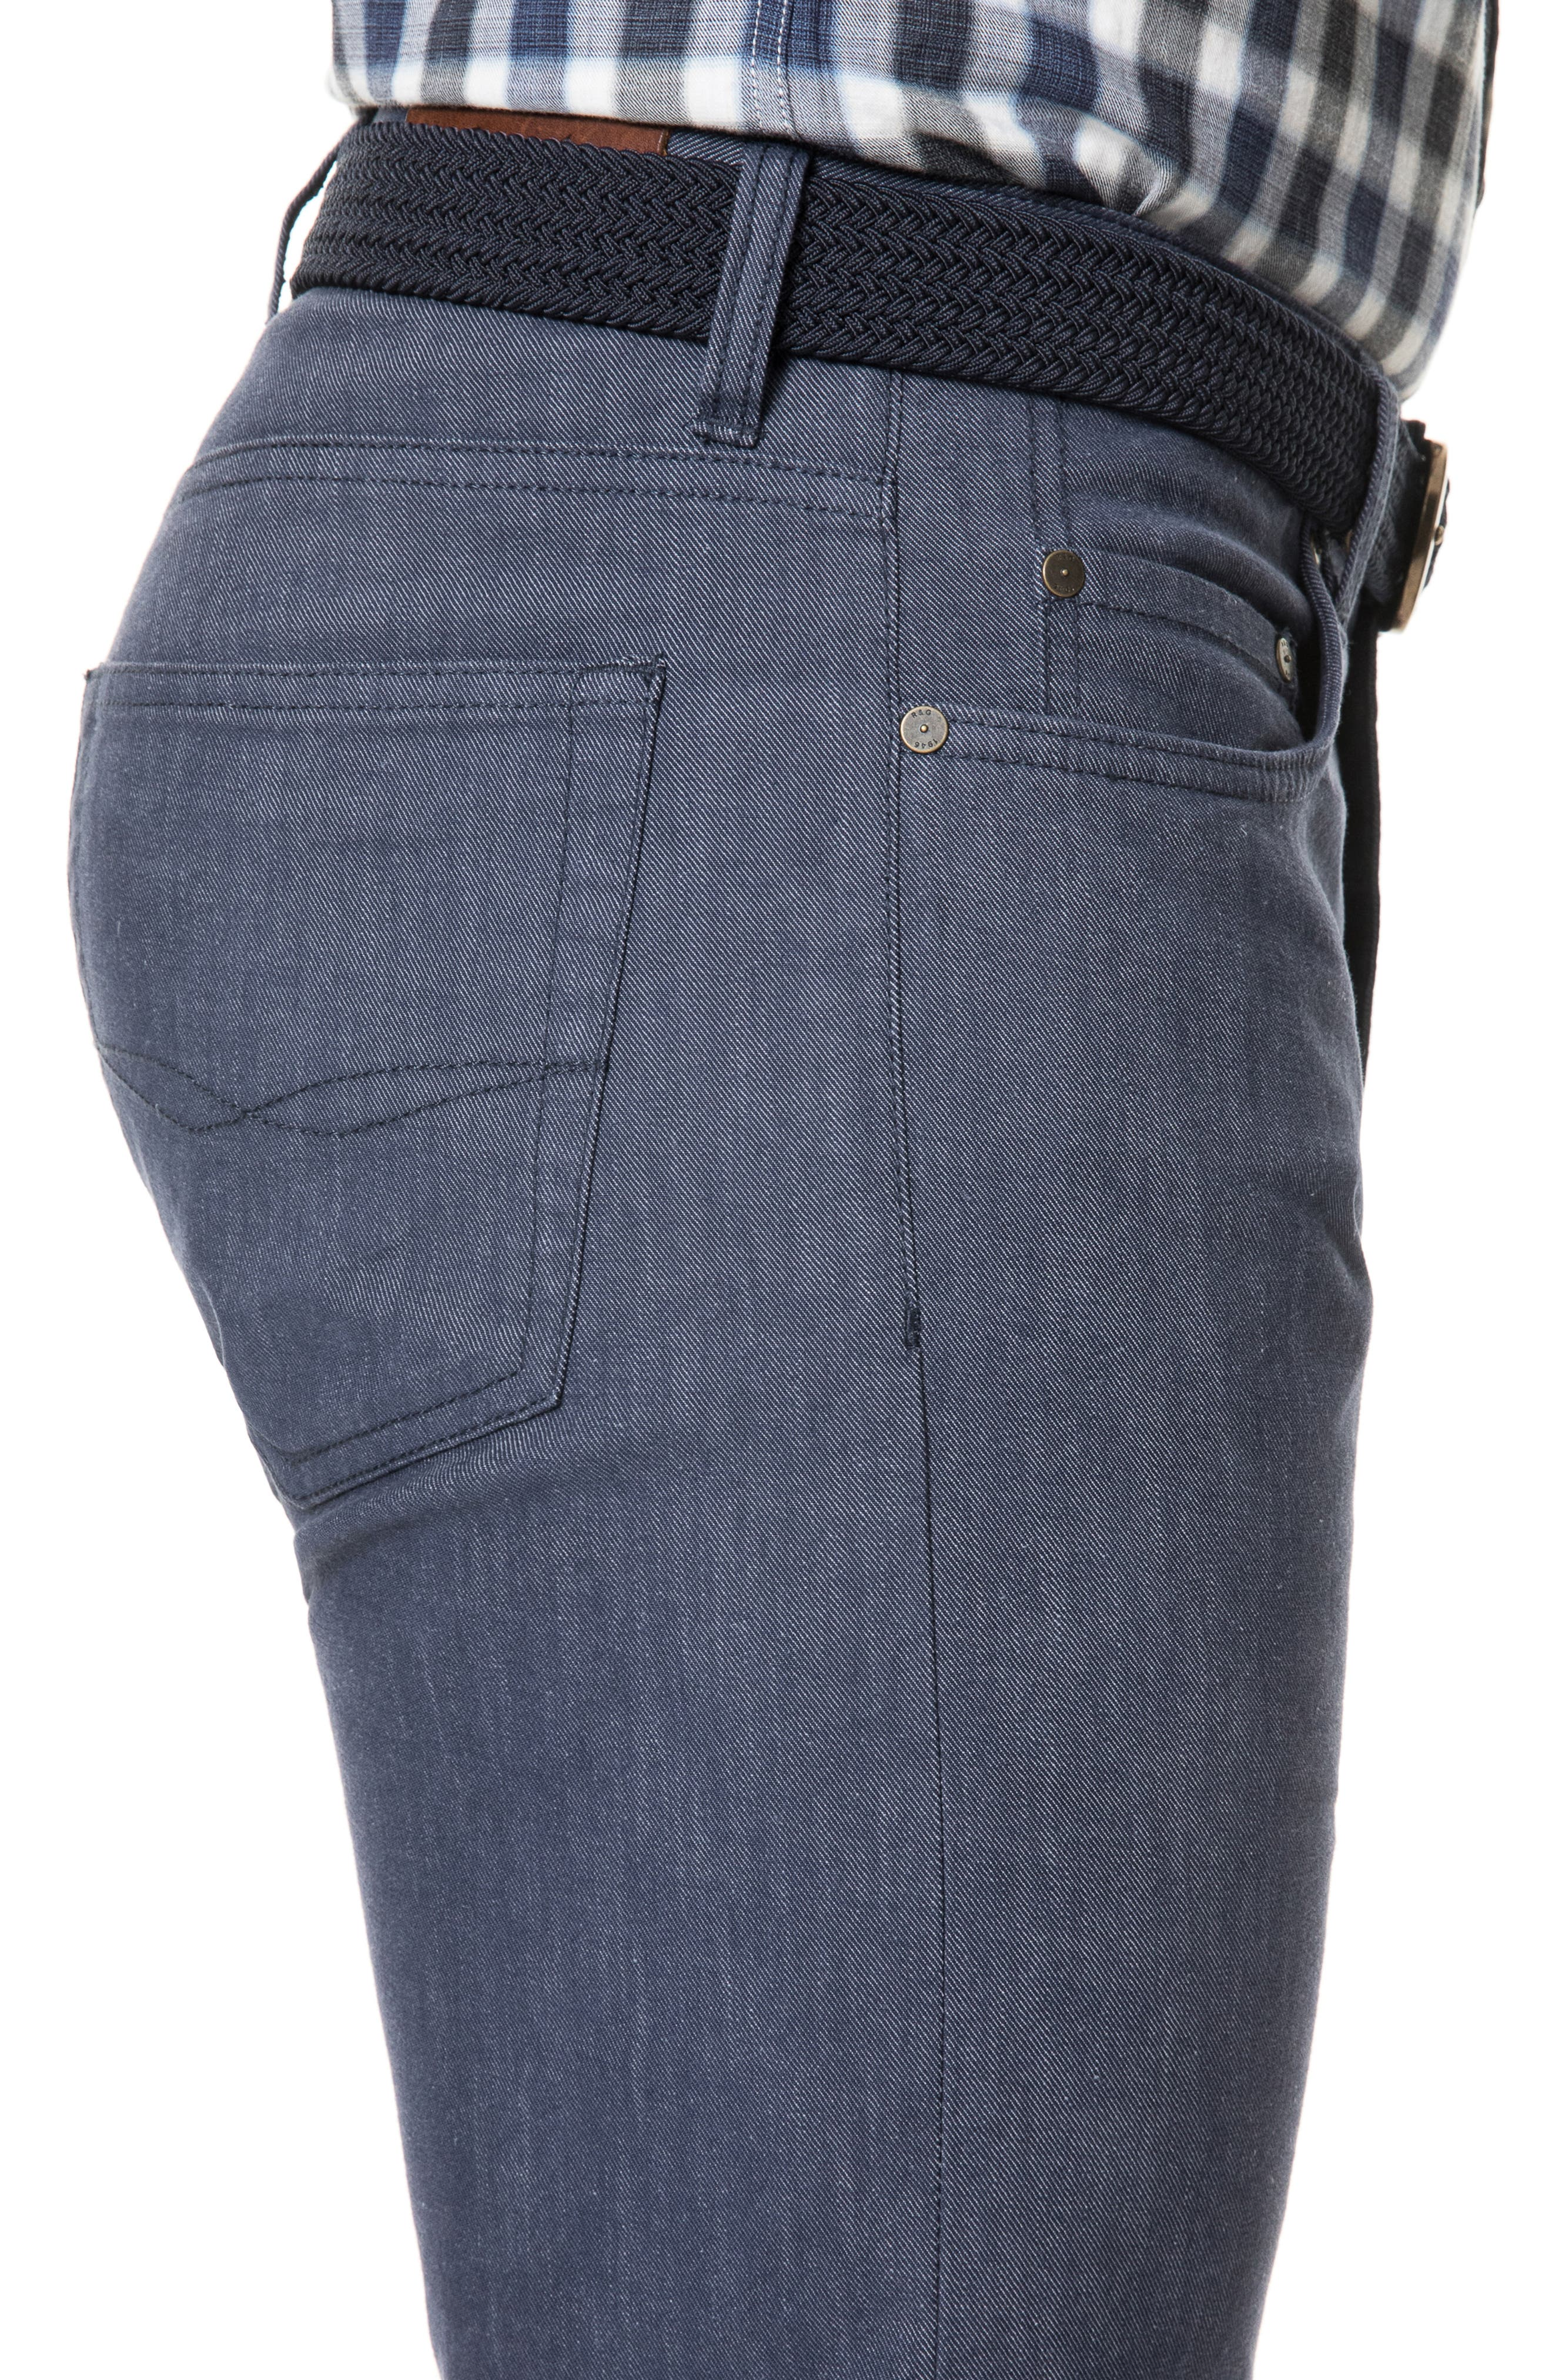 Amisfield Regular Fit Jeans,                             Alternate thumbnail 3, color,                             DUSK